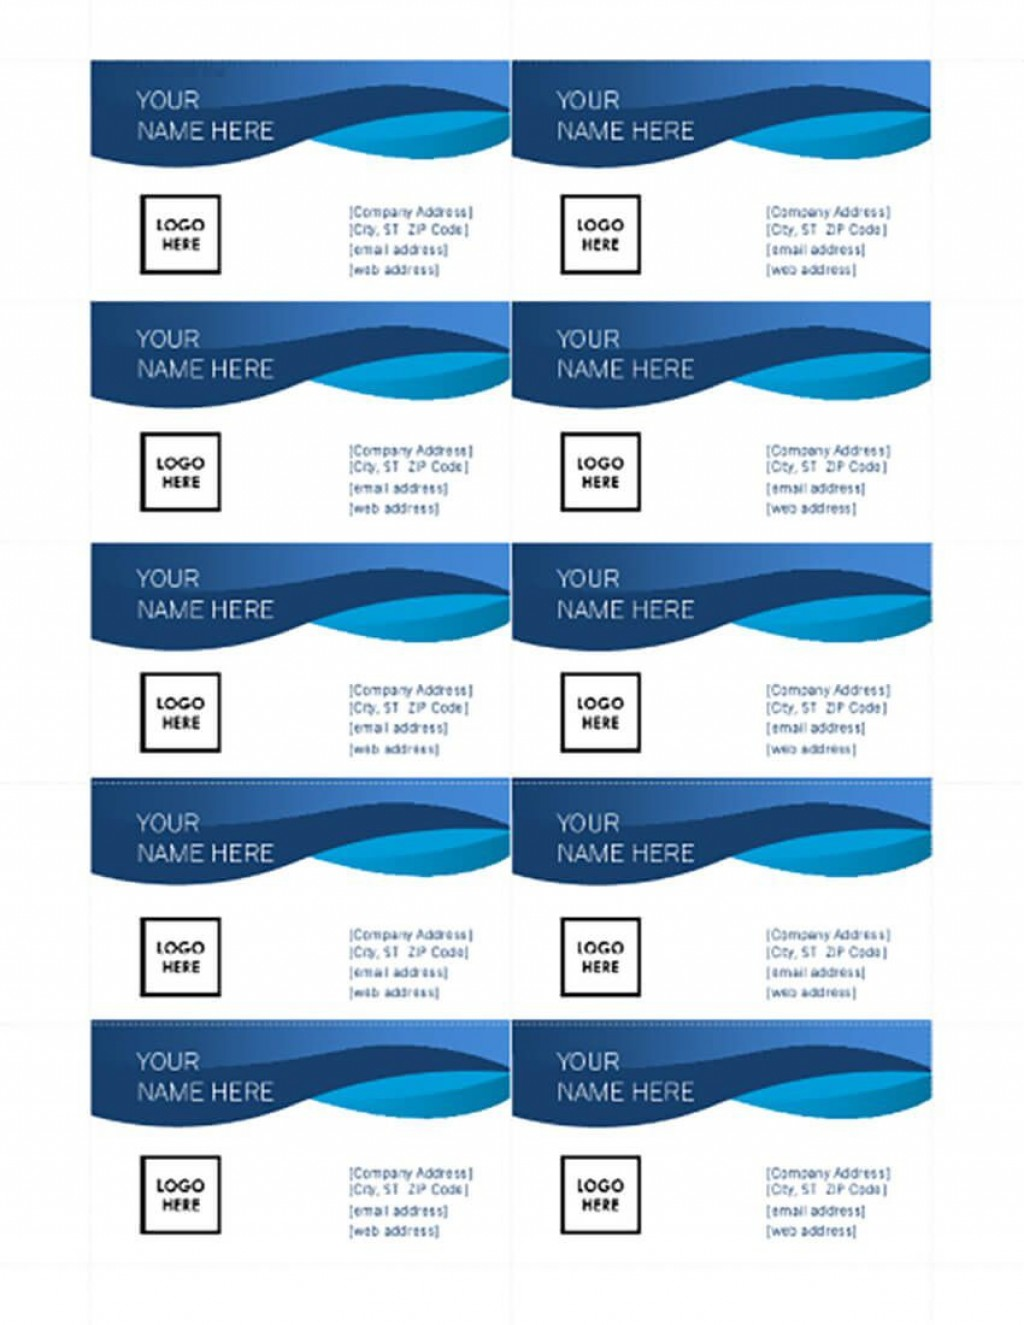 003 Fascinating Simple Busines Card Template Microsoft Word Sample Large